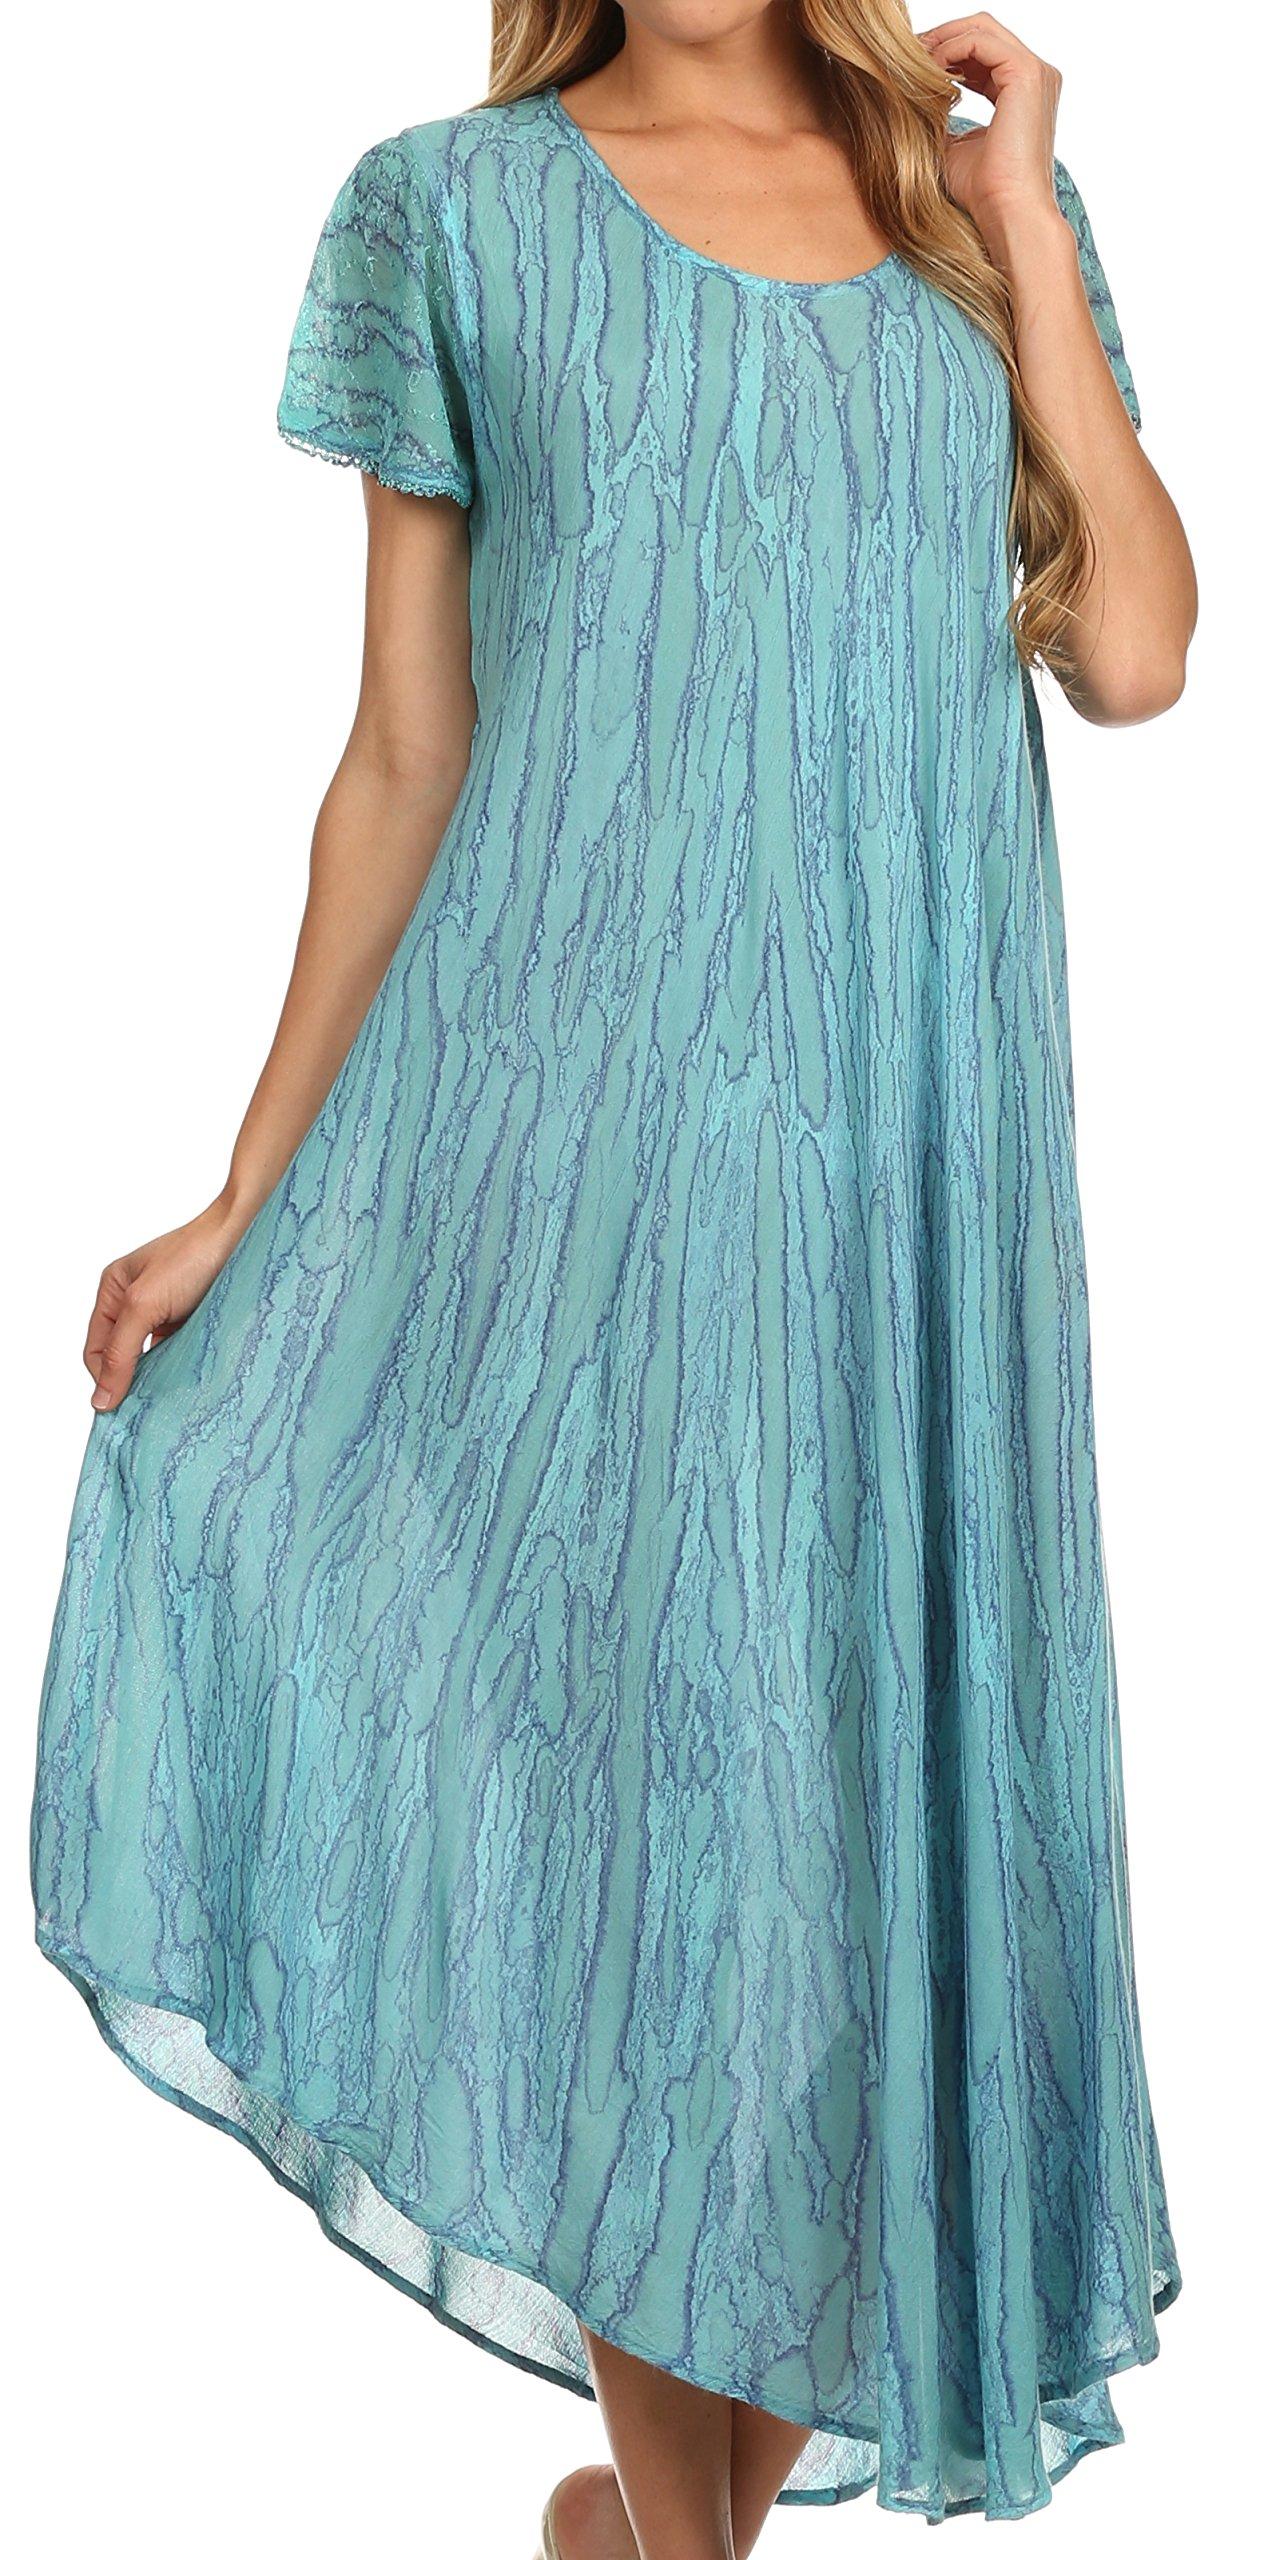 Sakkas 14802 - Faye Cap Sleeved Cotton Caftan Cover Up Dress - Turquoise - OS